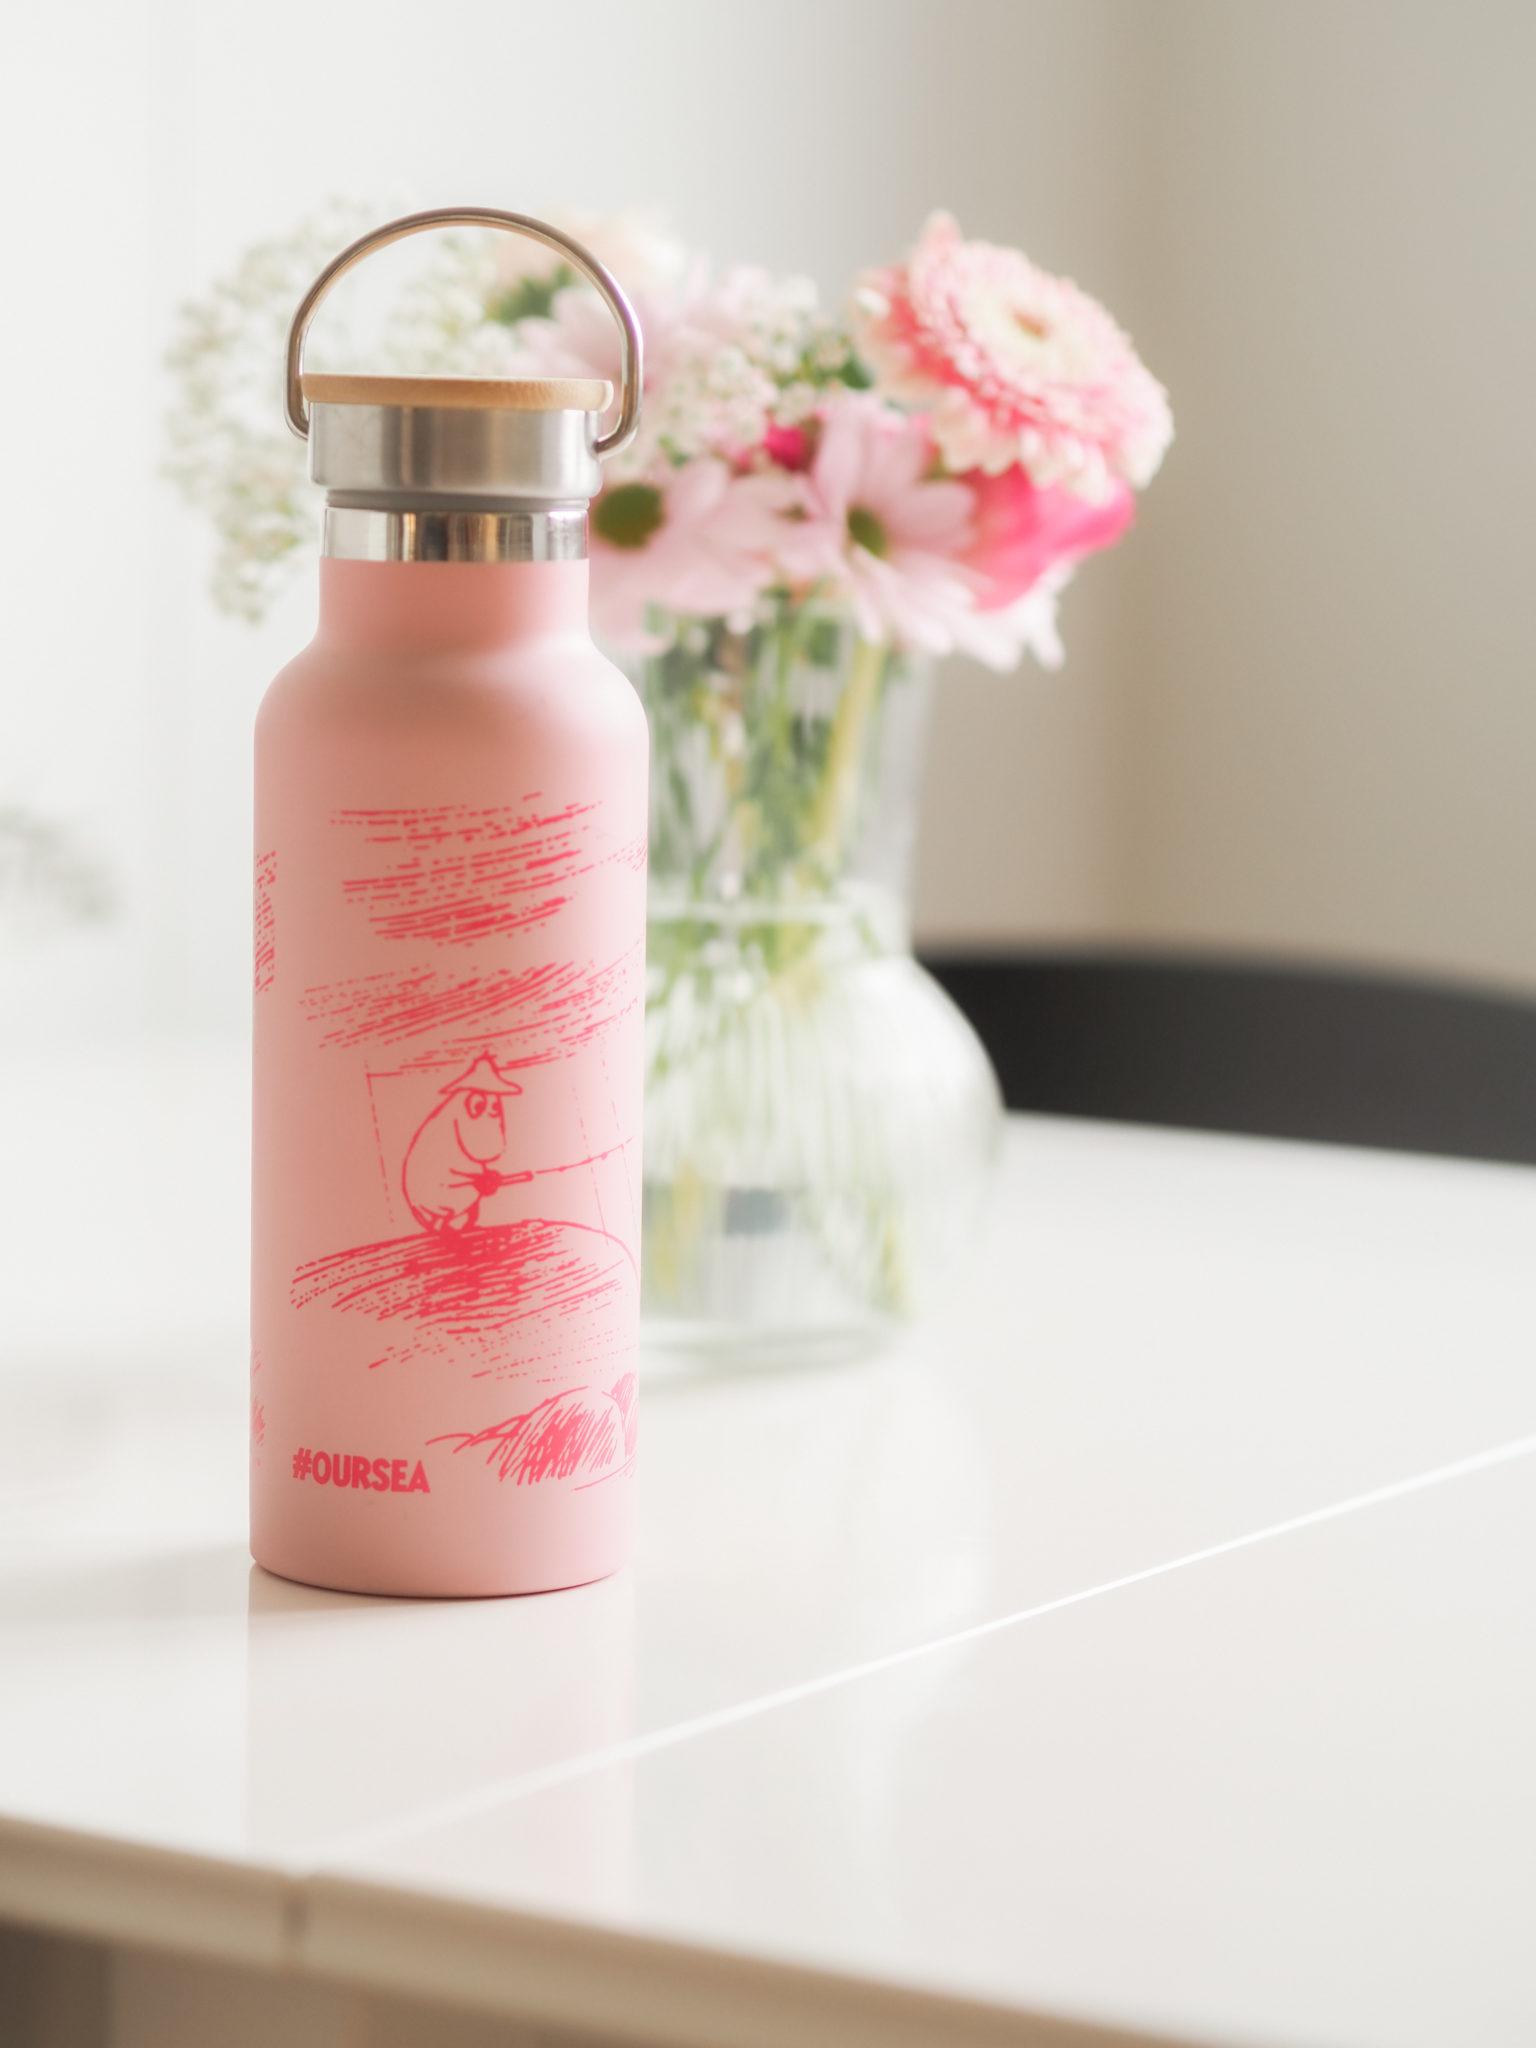 Martinex - Muumit Oursea vaaleanpunainen juomapullo - BMH - Big mamas home by Jenni